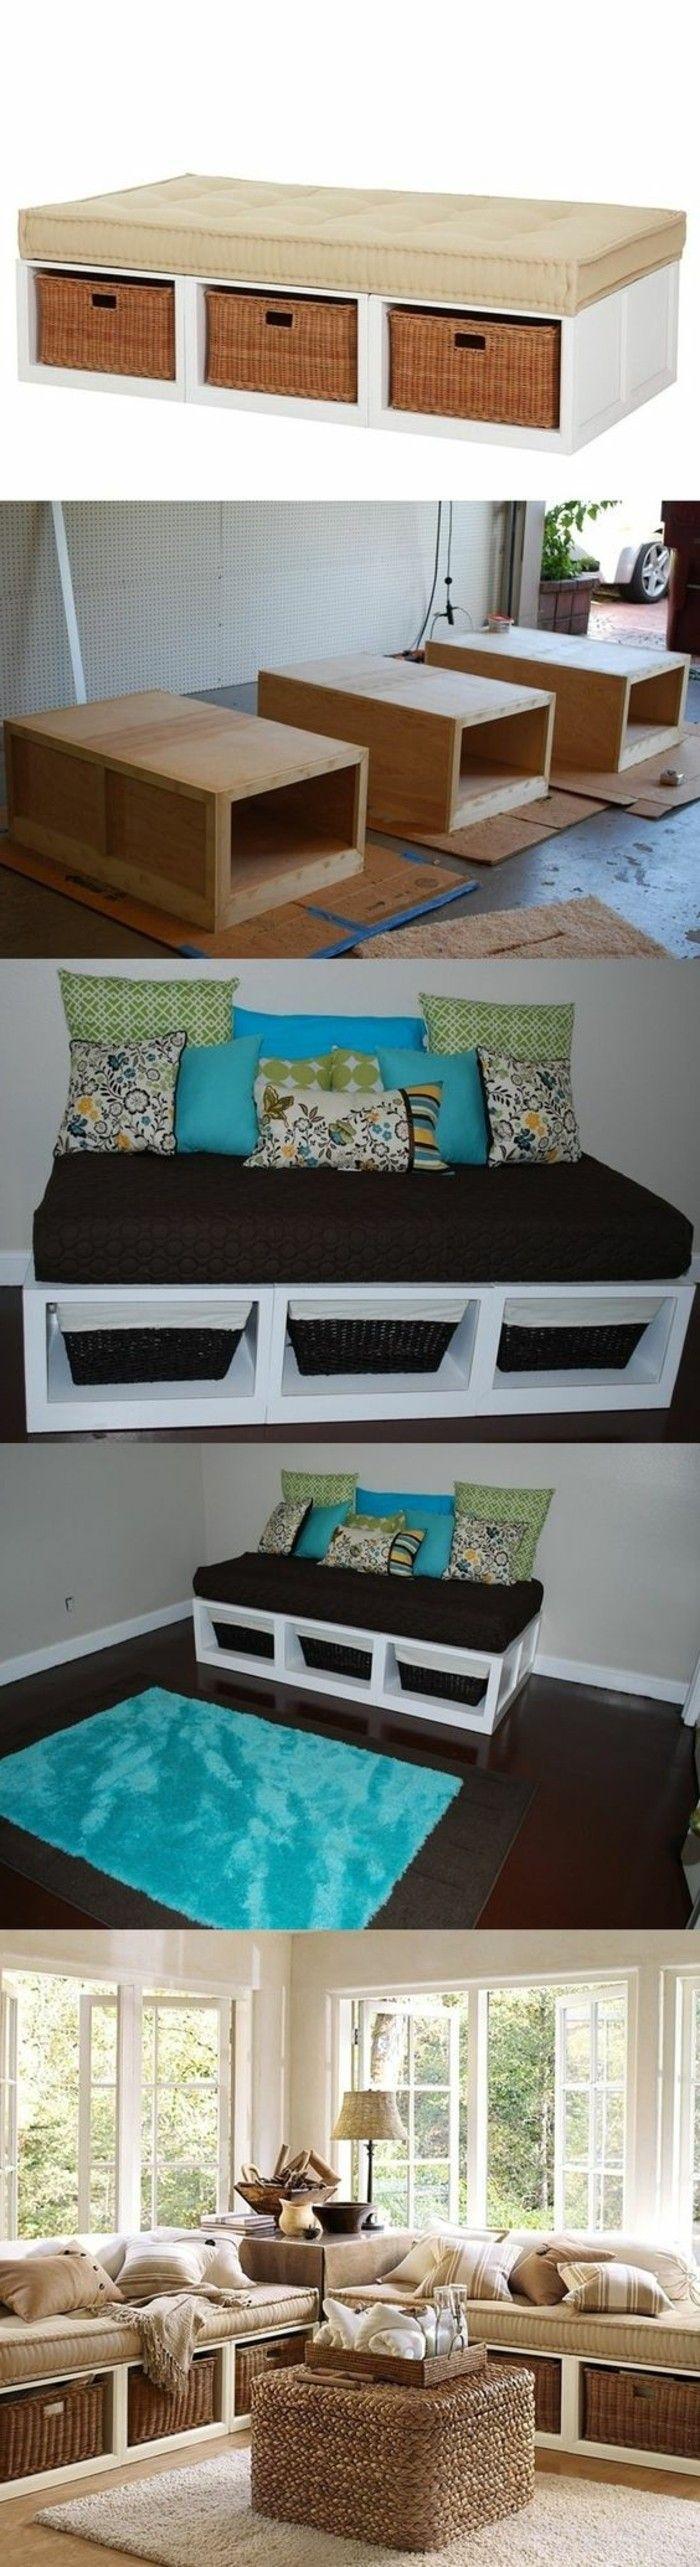 Diy Moebel Kreative Wohnideen Sofa Aus Holz Und Geflochtenen Koerben Selber  Baeuen